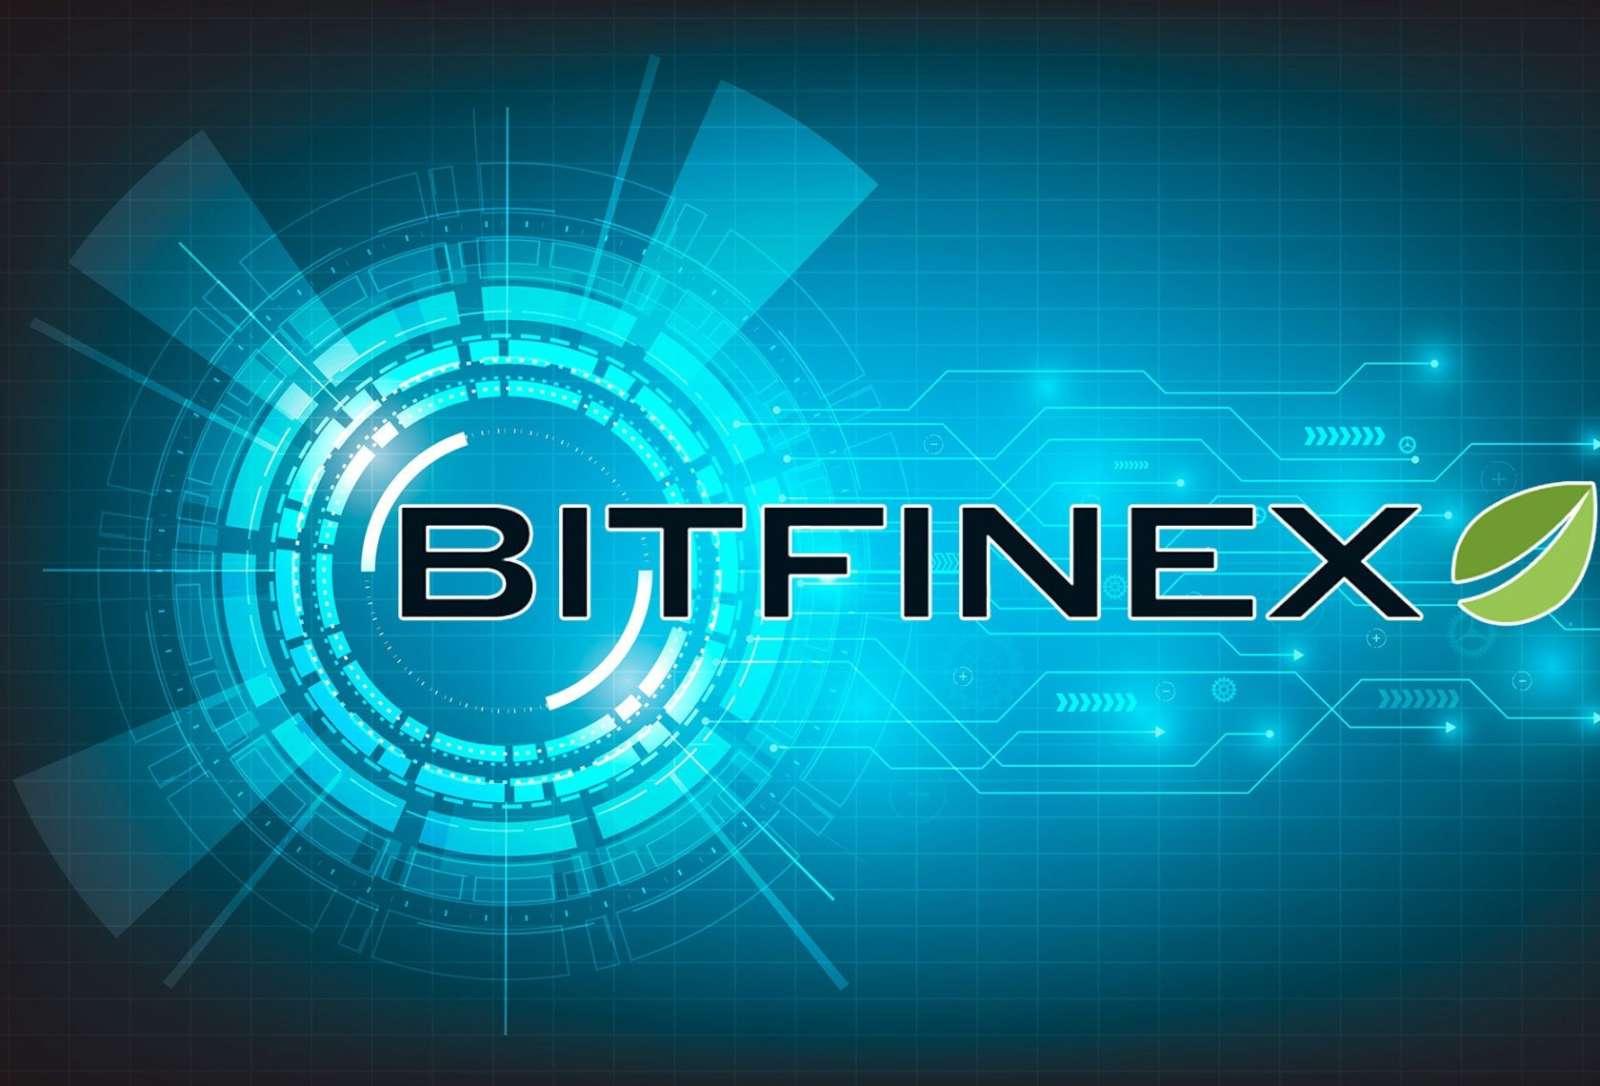 Bitfinex не страшат снижения объемов торговли, — глава биржи